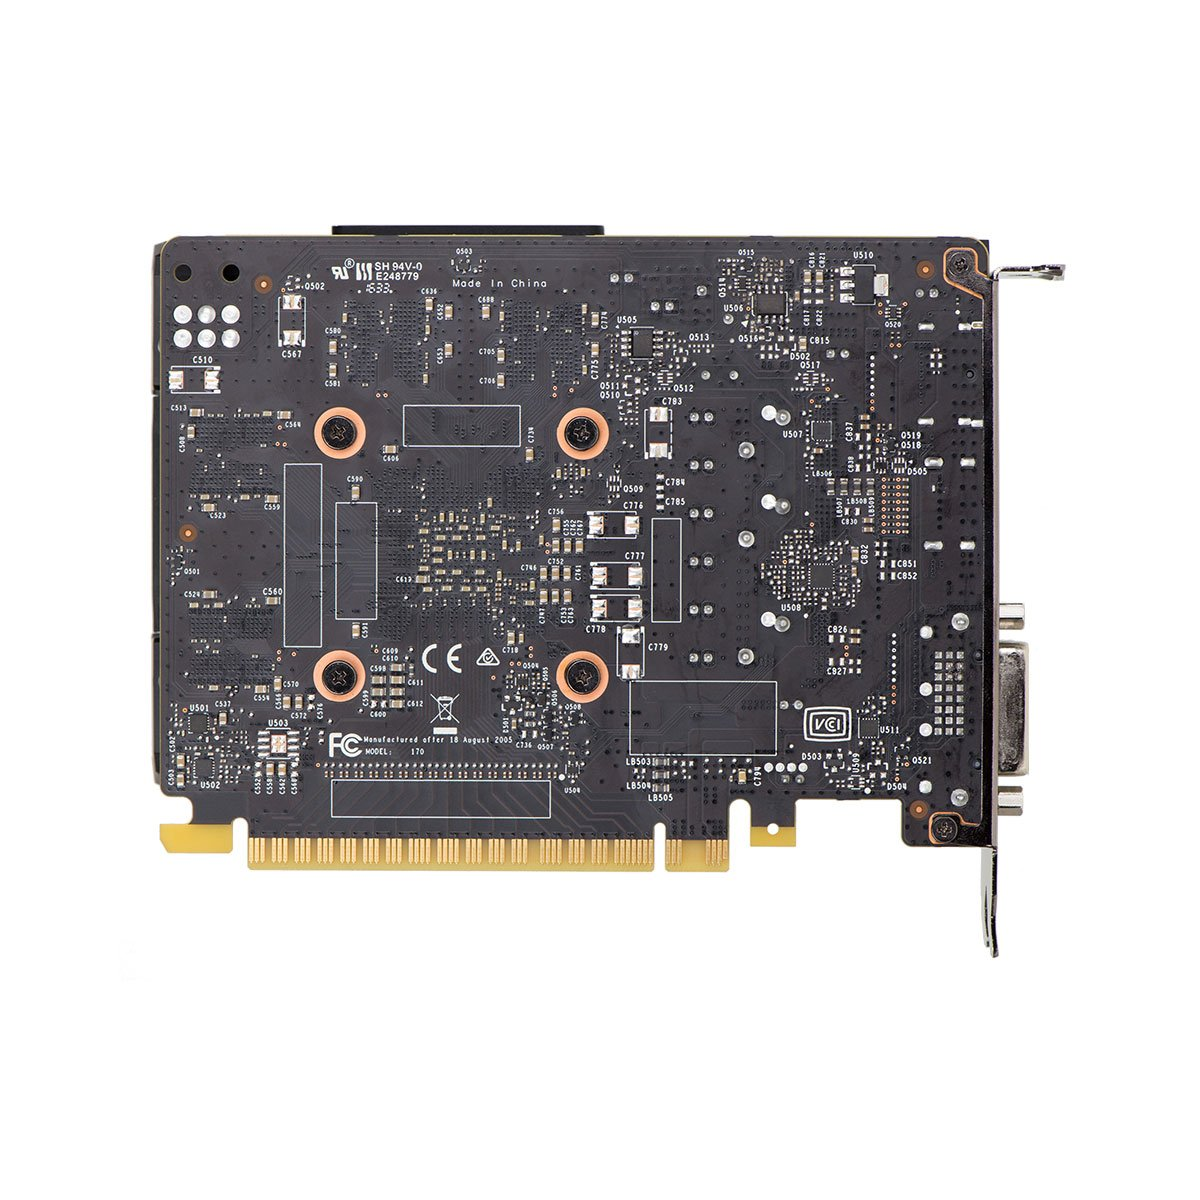 EVGA GeForce GTX 1050 Ti SC GAMING, 4GB GDDR5, DX12 OSD Support (PXOC) Graphics Card 04G-P4-6253-KR by EVGA (Image #3)